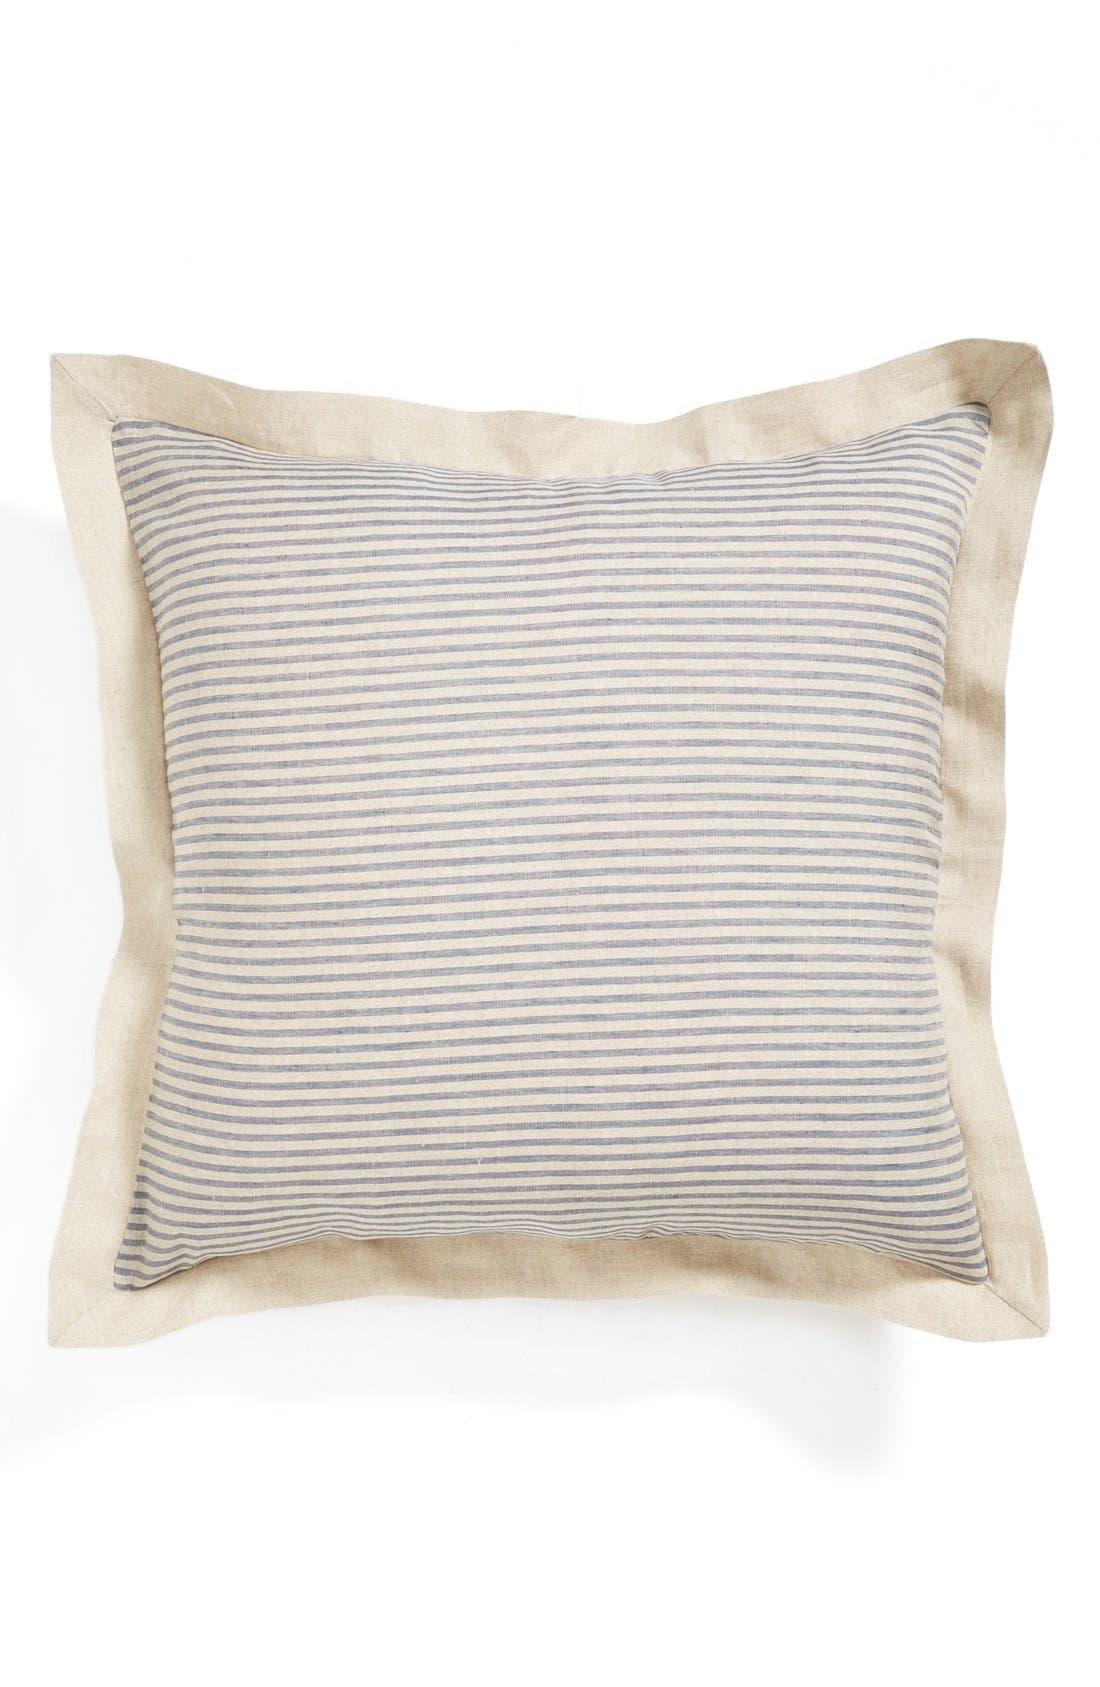 Main Image - Amity Home 'Bernadette' Stripe Linen Euro Sham